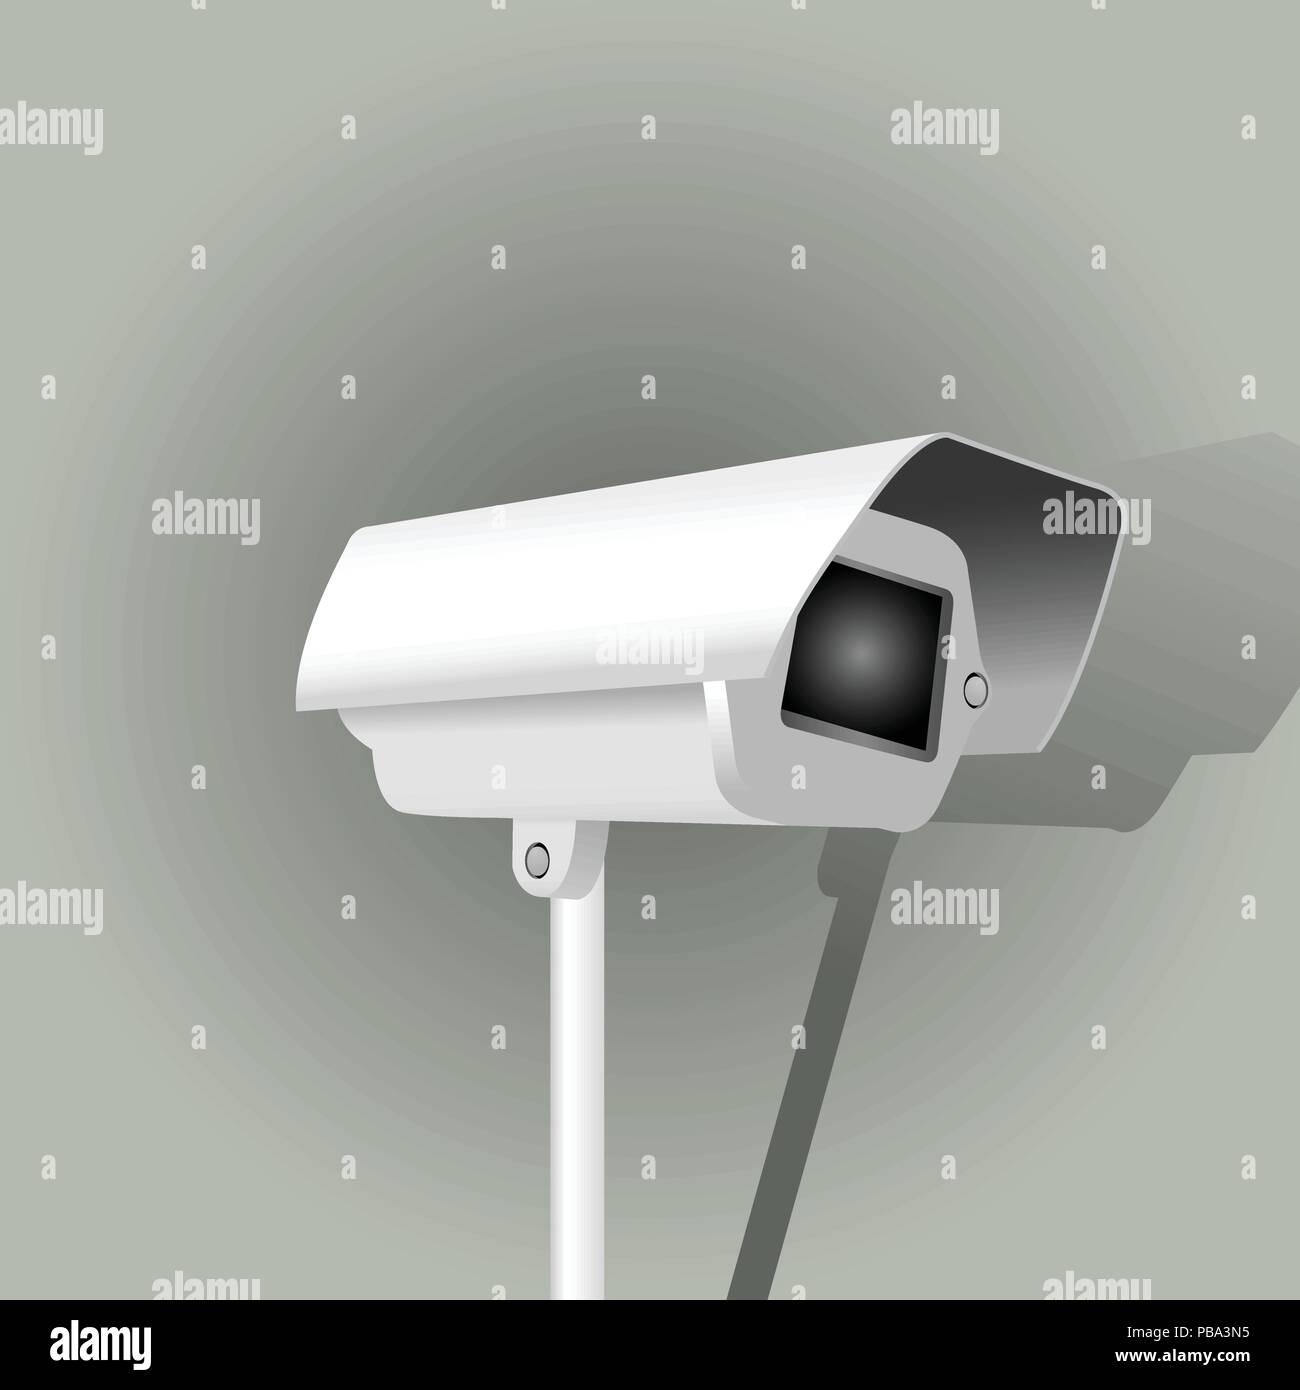 Surveillance camera on grey background - security camera - Stock Image